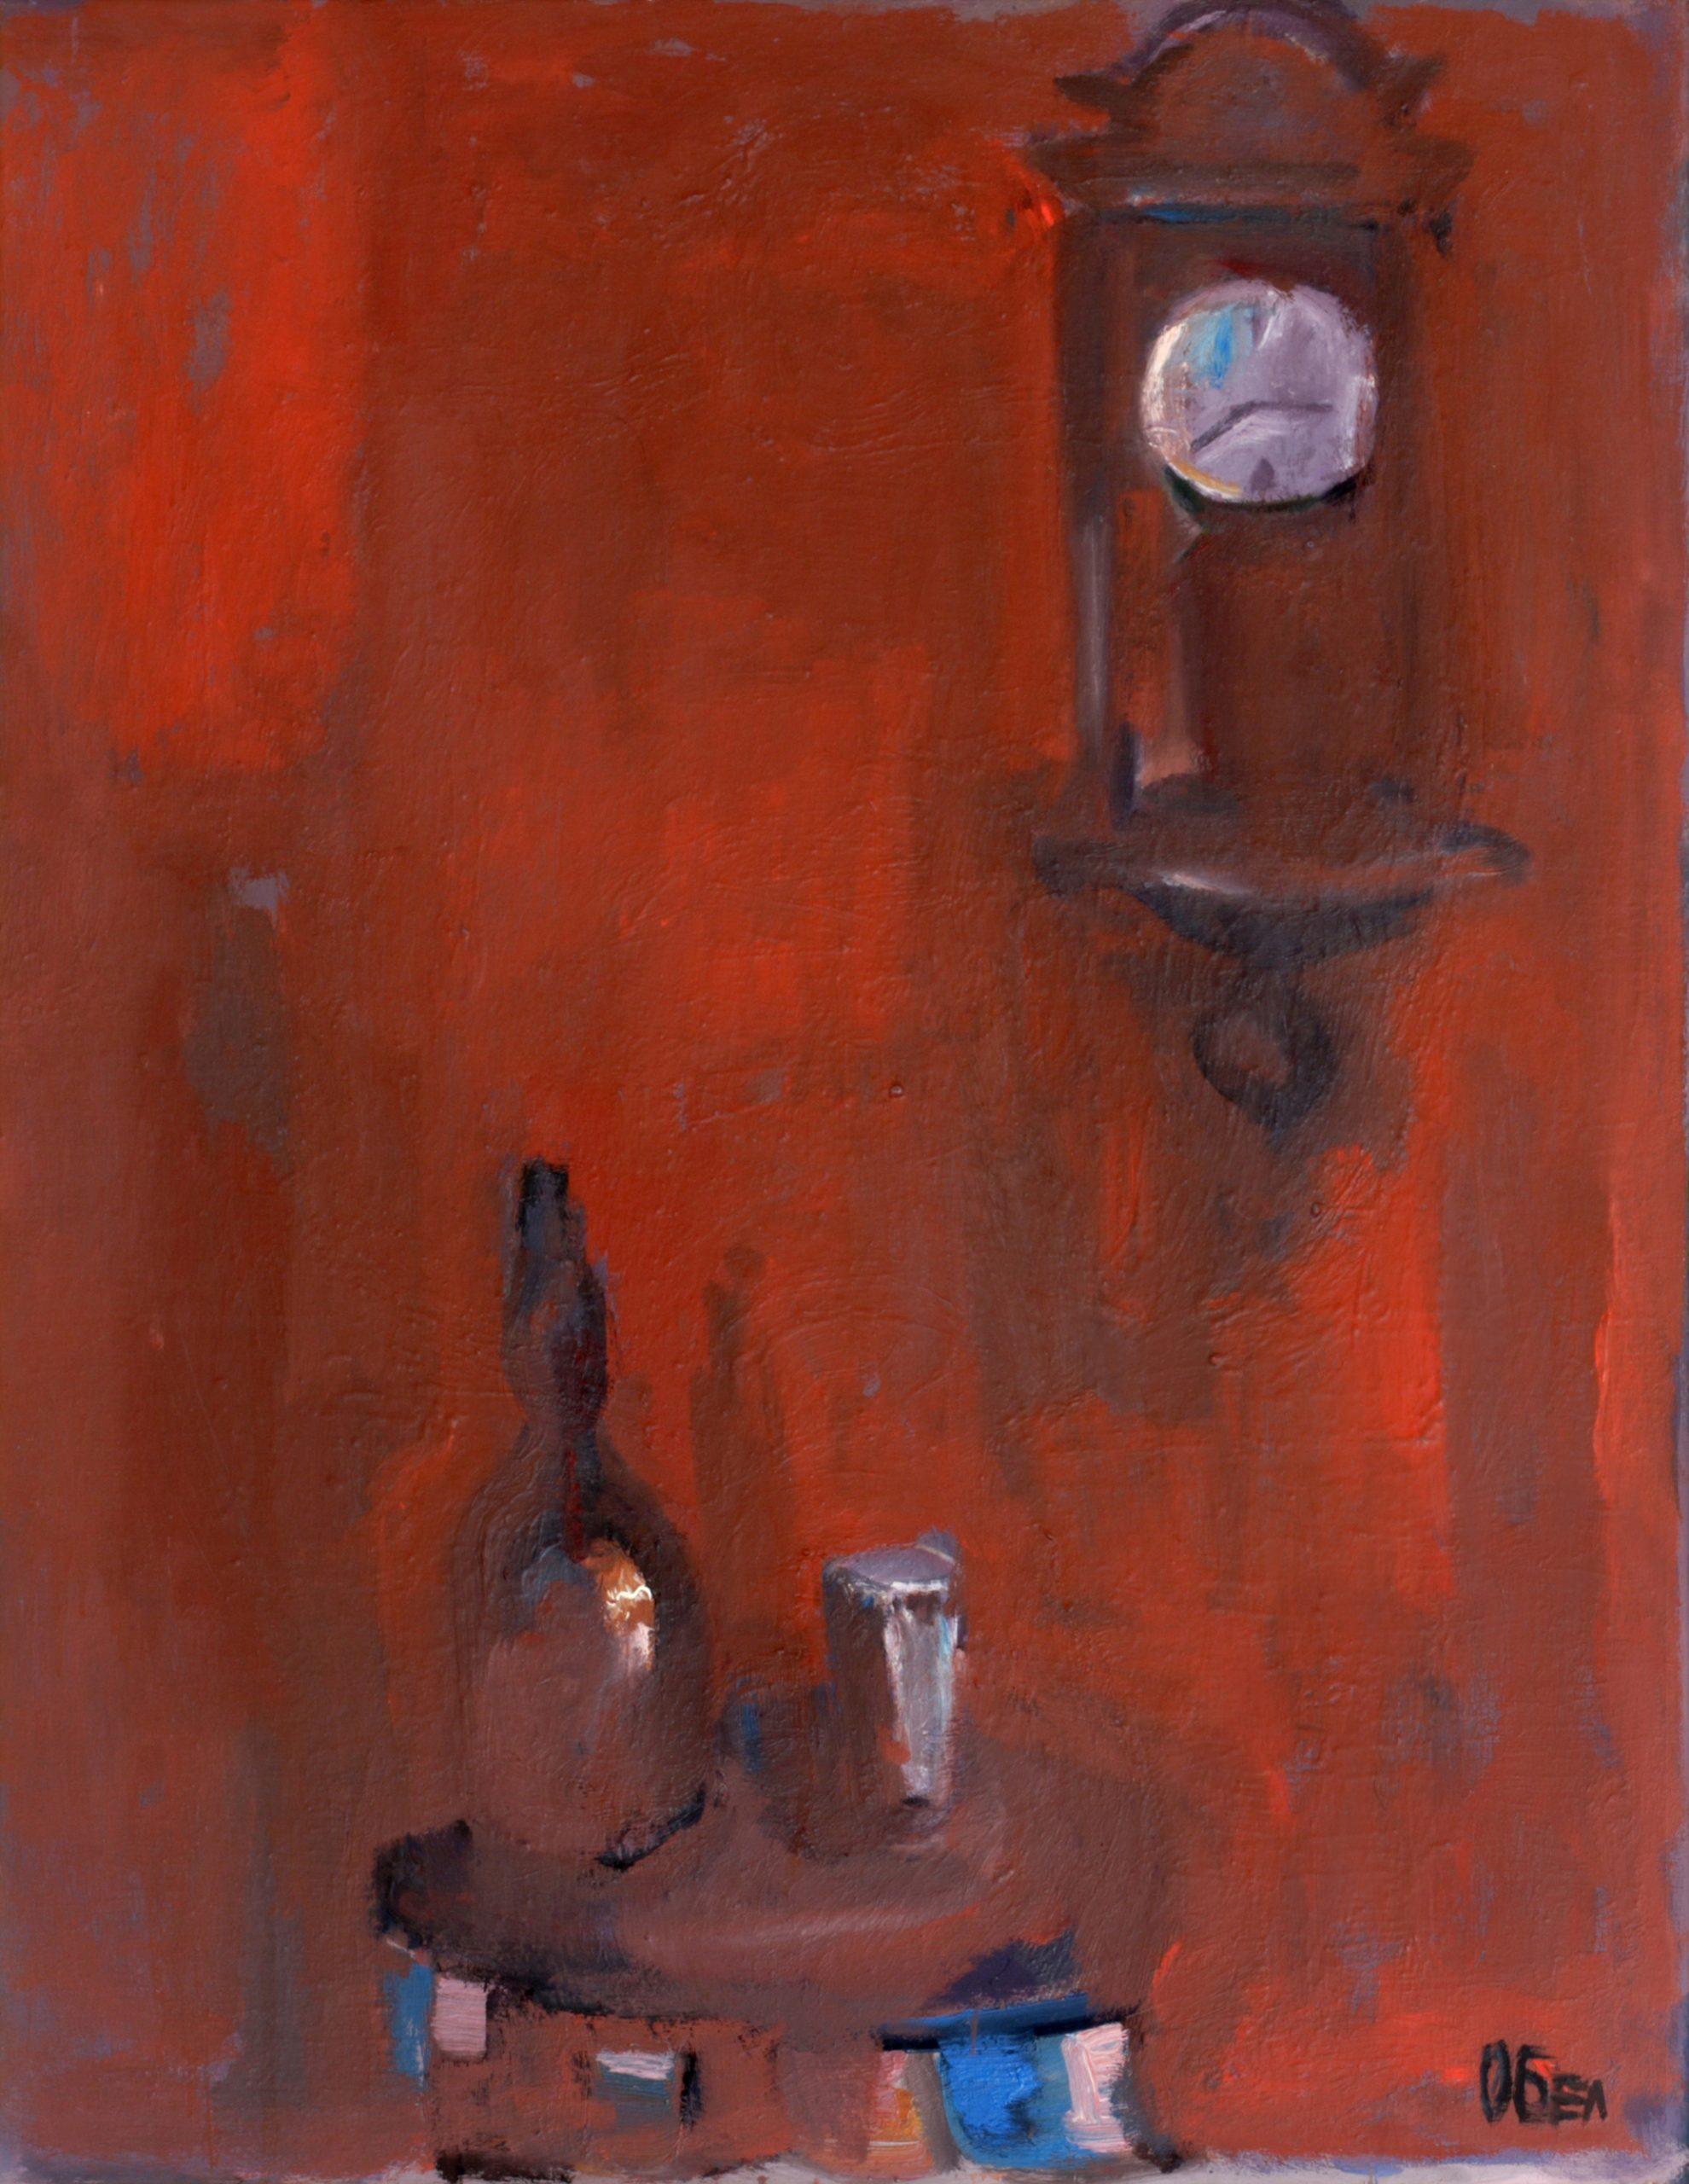 Натюрморт 'Спрелият часовник' от Олга Белопитова